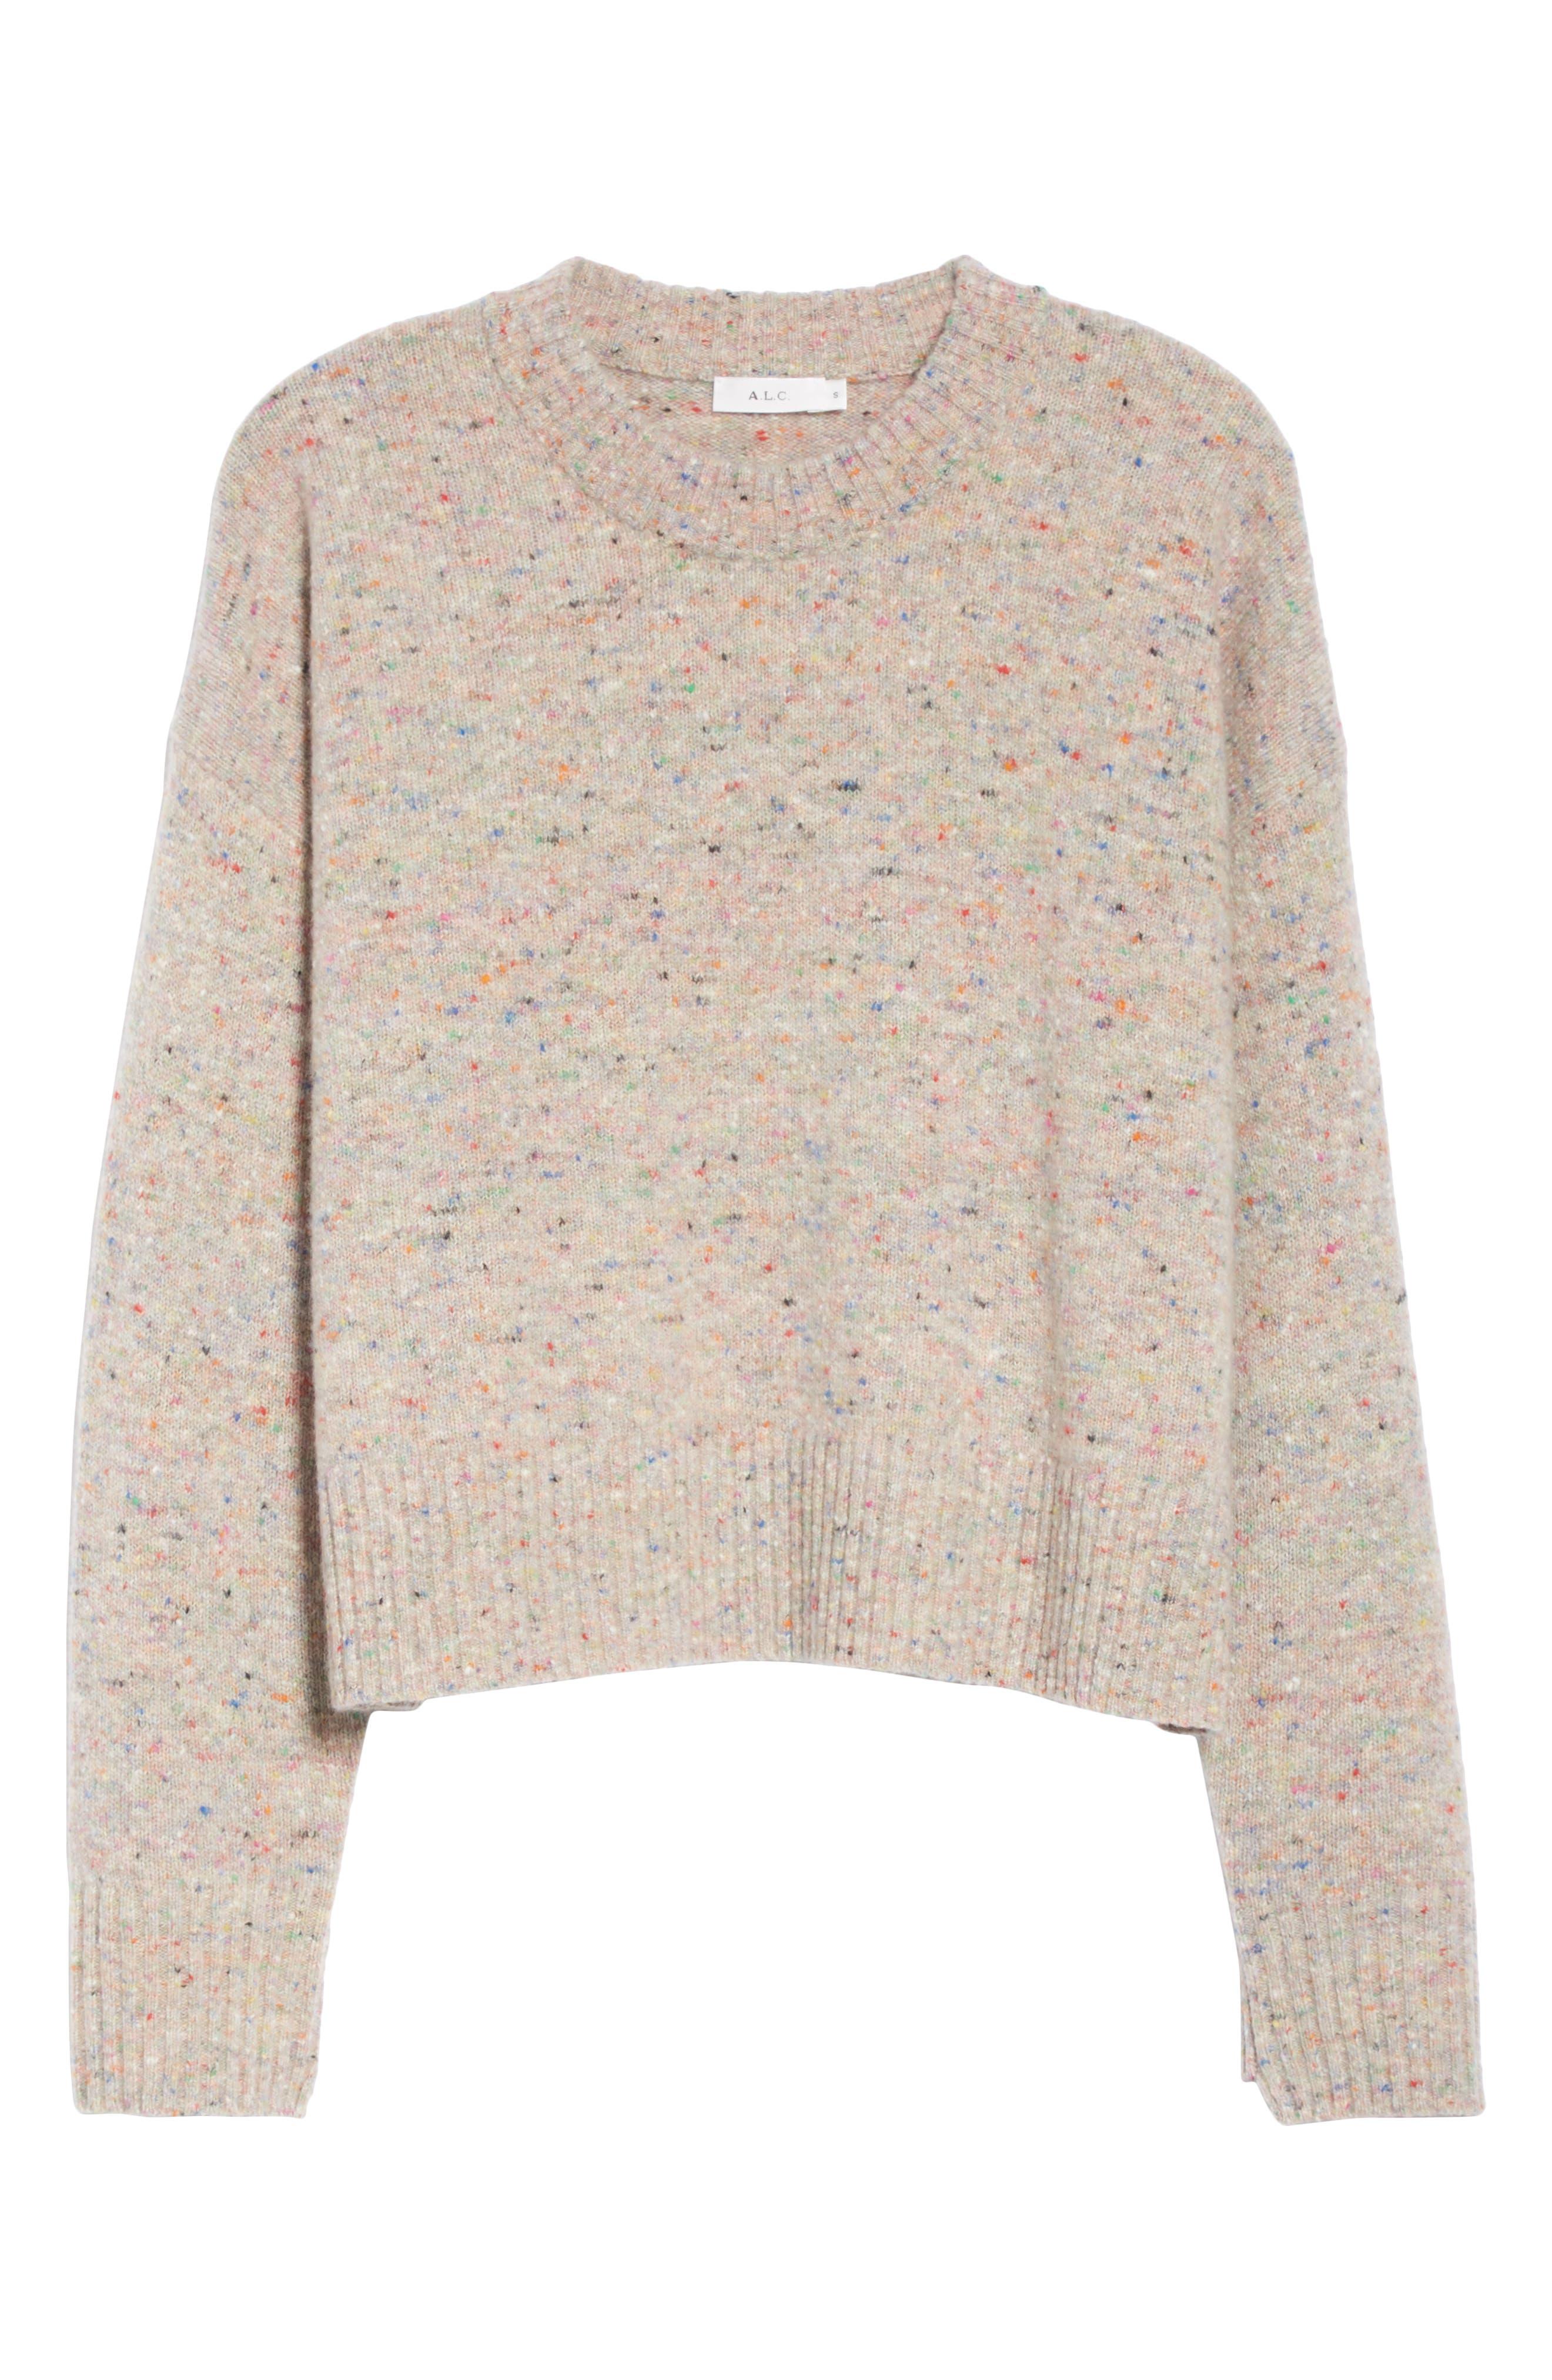 Emmeline Lambswool & Cashmere Blend Sweater,                             Alternate thumbnail 6, color,                             MULTICOLOR